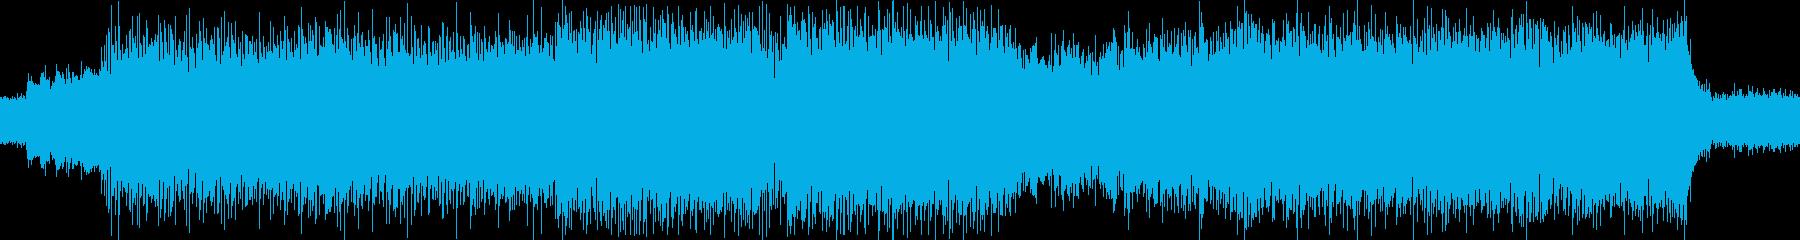 SFチックなボス戦BGM(ループ可)の再生済みの波形